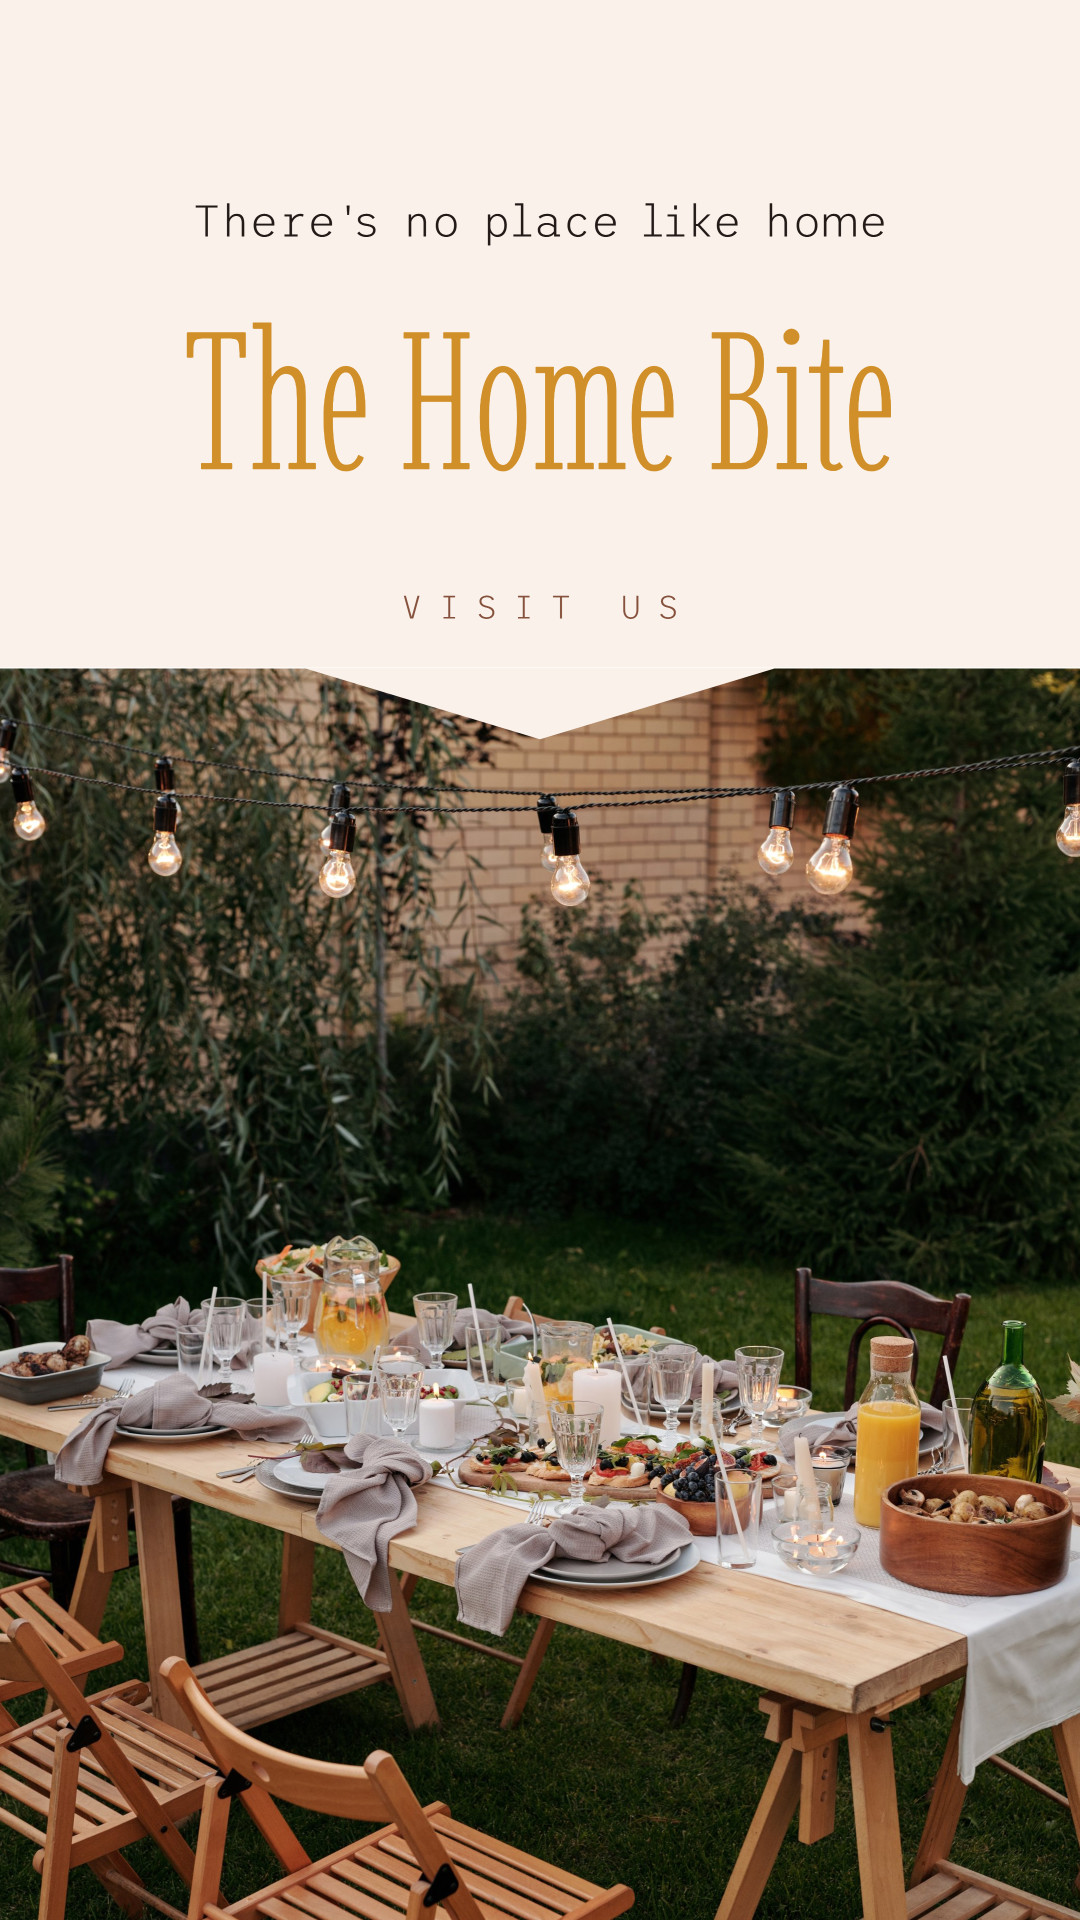 Restaurant Instagram story template design